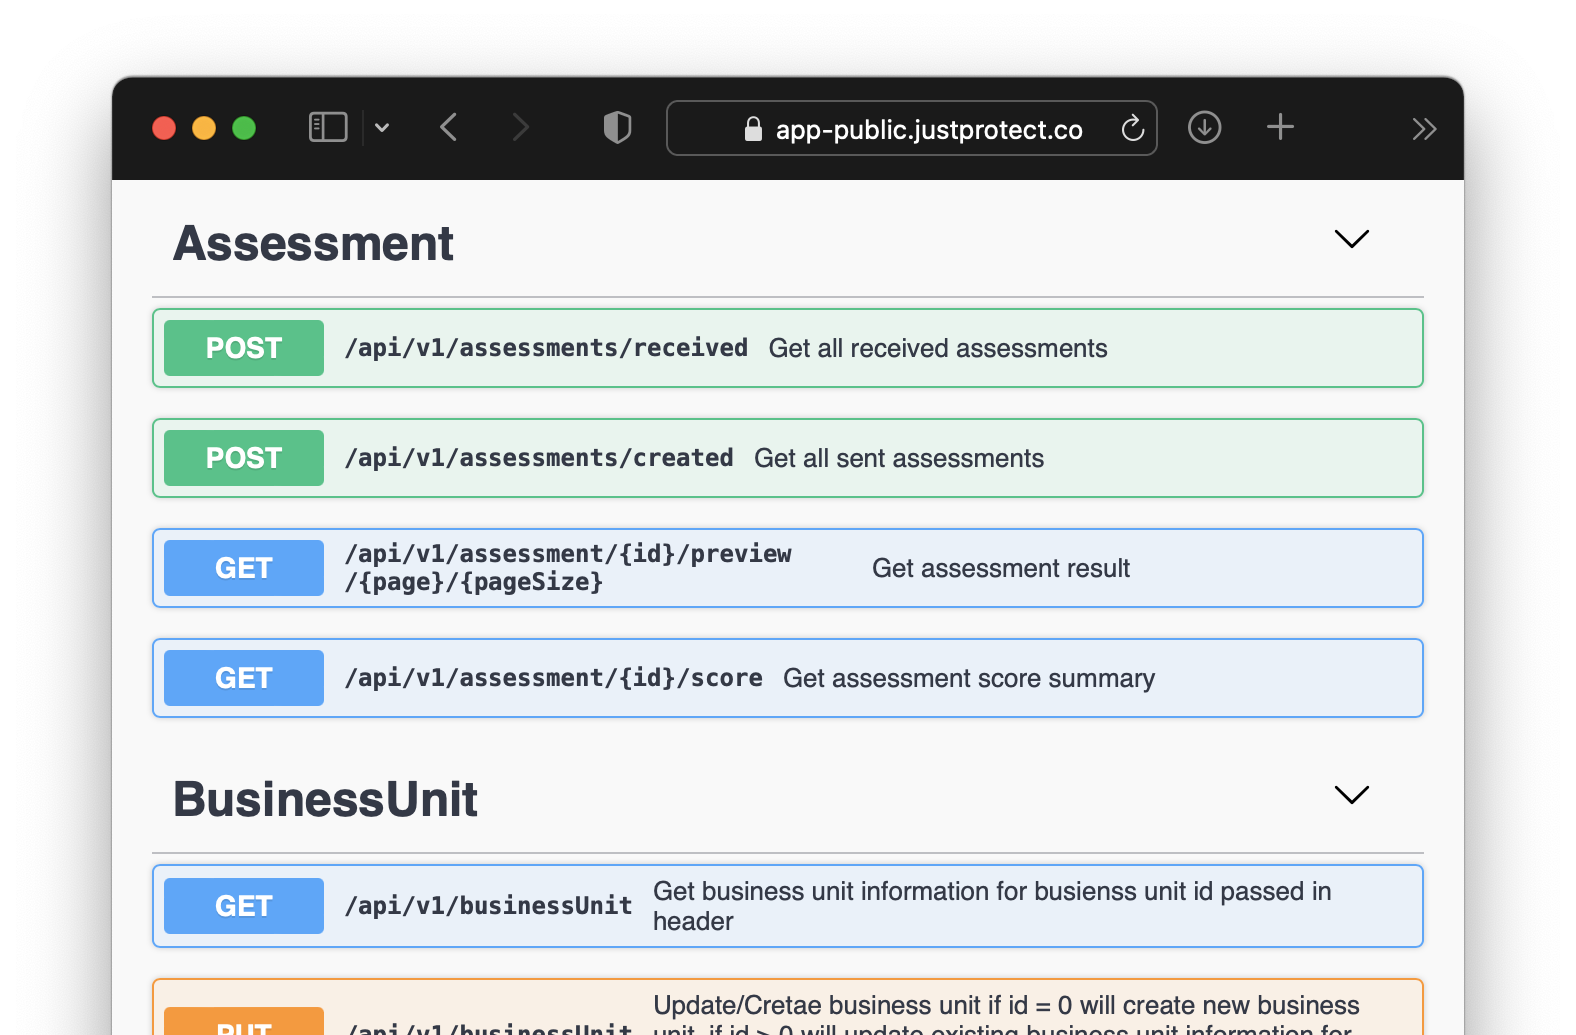 JustProtect API